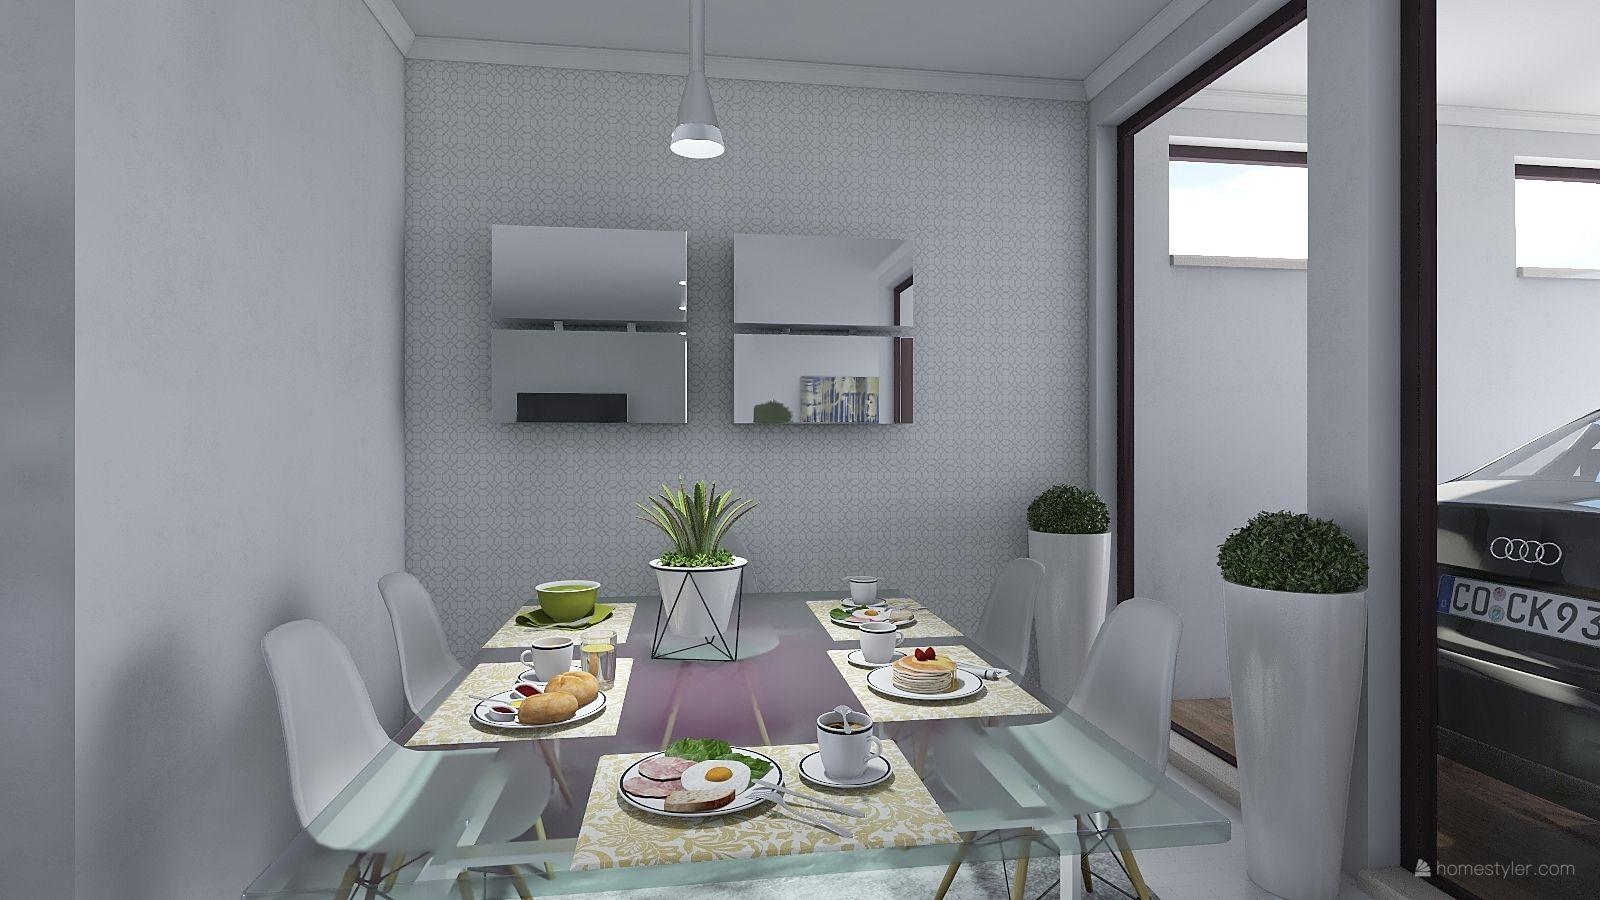 Dining Room Design By Caty Home Design Software 3d Home Design